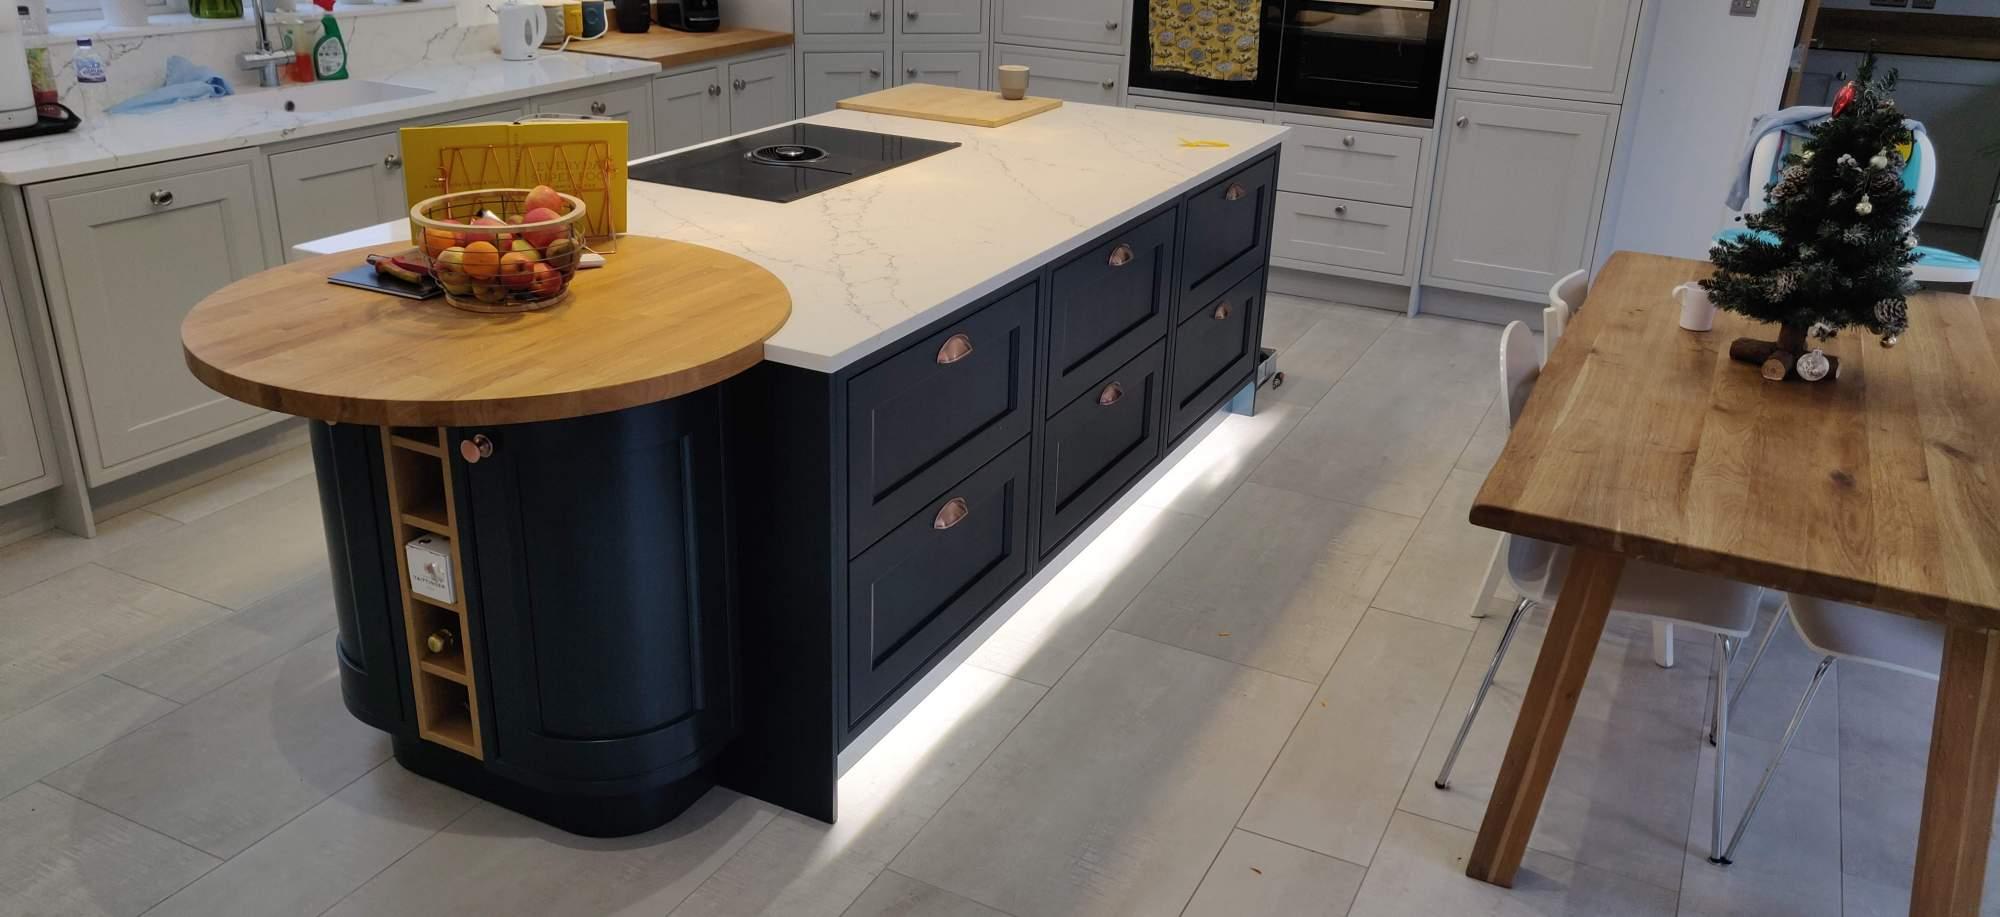 Hague Blue Kitchen Island, AEG Vented Recirculating Hob, LED plinth lights